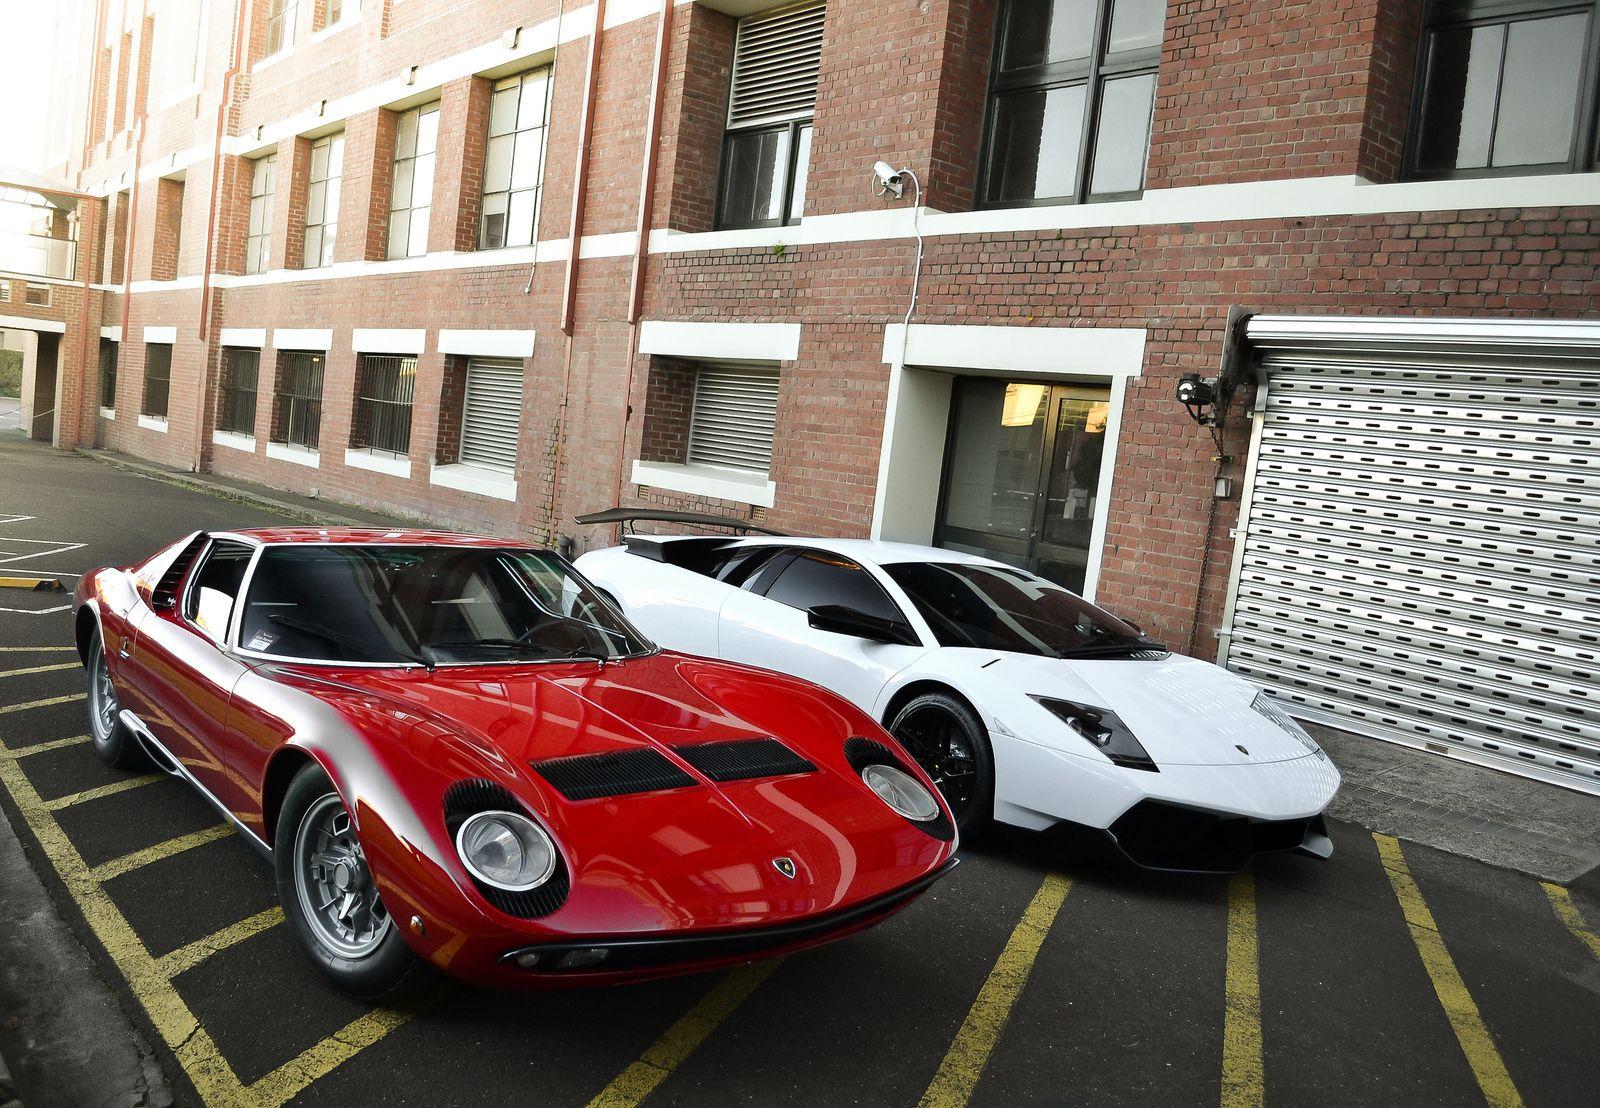 Old Vs New Cars Lamborghini Lamborghini Cars Cars